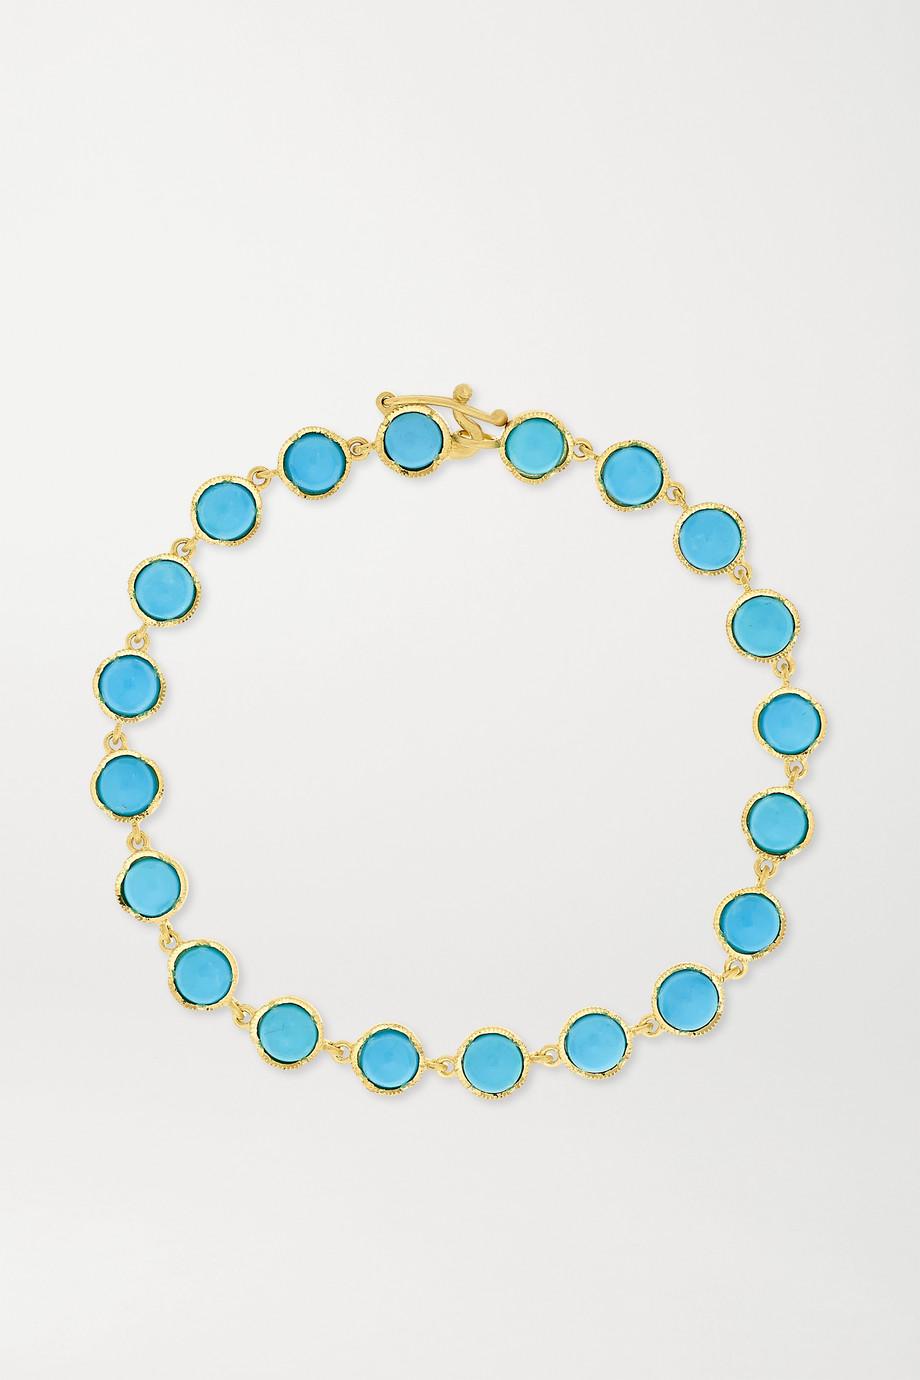 Irene Neuwirth Classic 18-karat gold turquoise bracelet